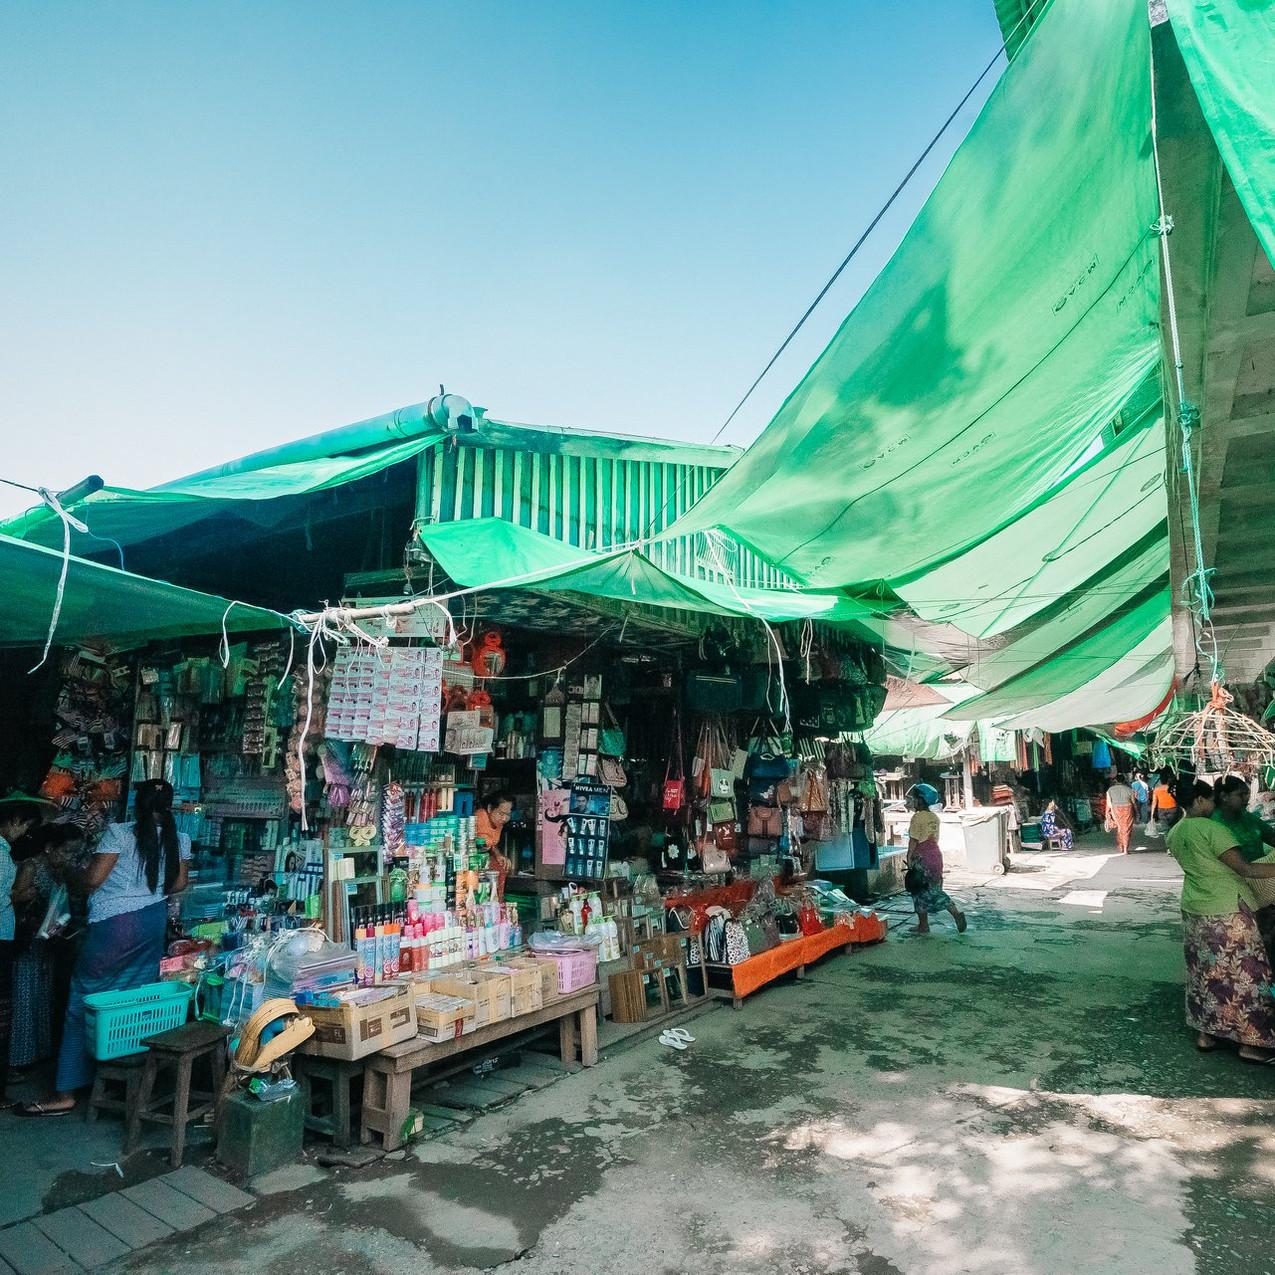 Kale MyoMa Market